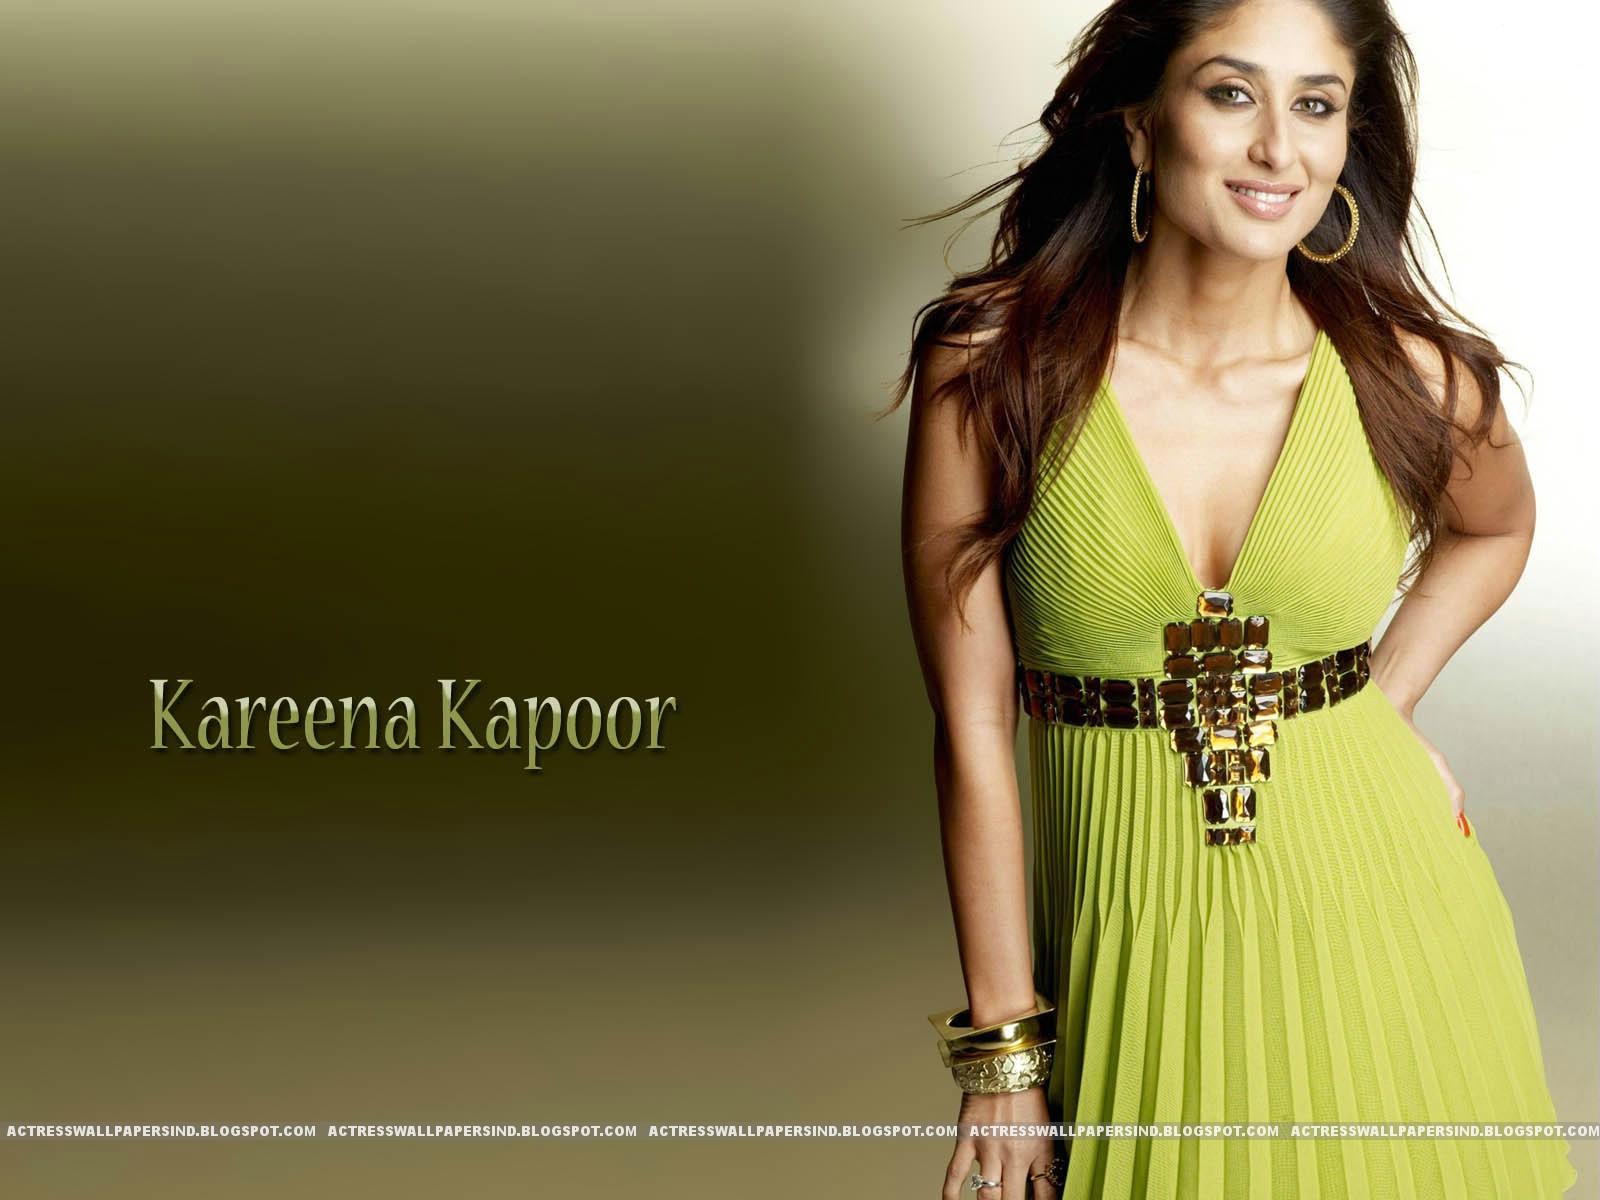 Kareena Kapoor Sexy Photo Hd Shoot Full Gallery - A Wind-6356